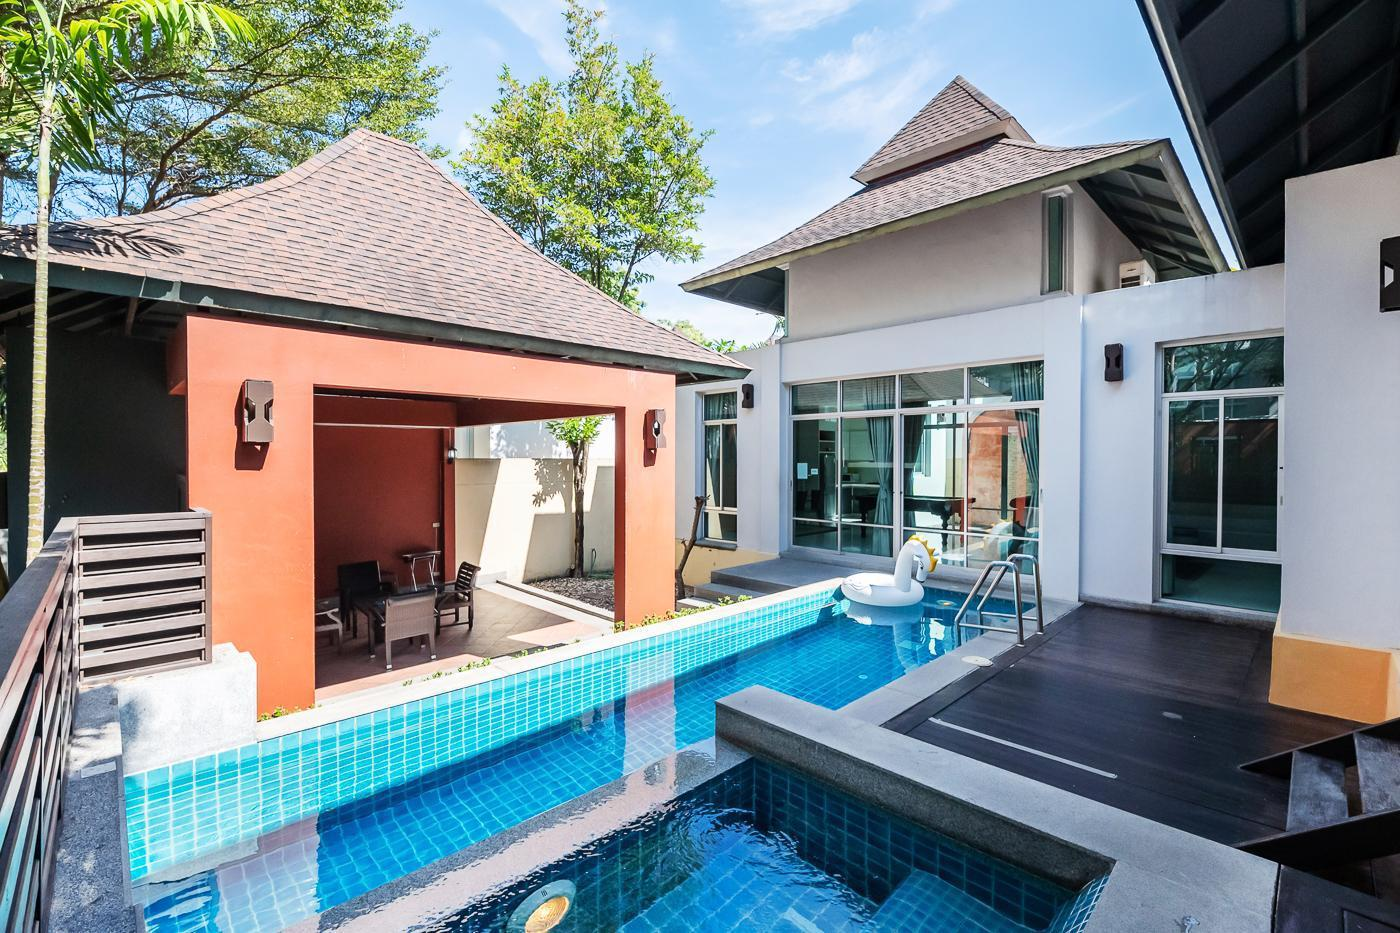 AnB pool villa with 2BR close to Jomtien beach AnB pool villa with 2BR close to Jomtien beach